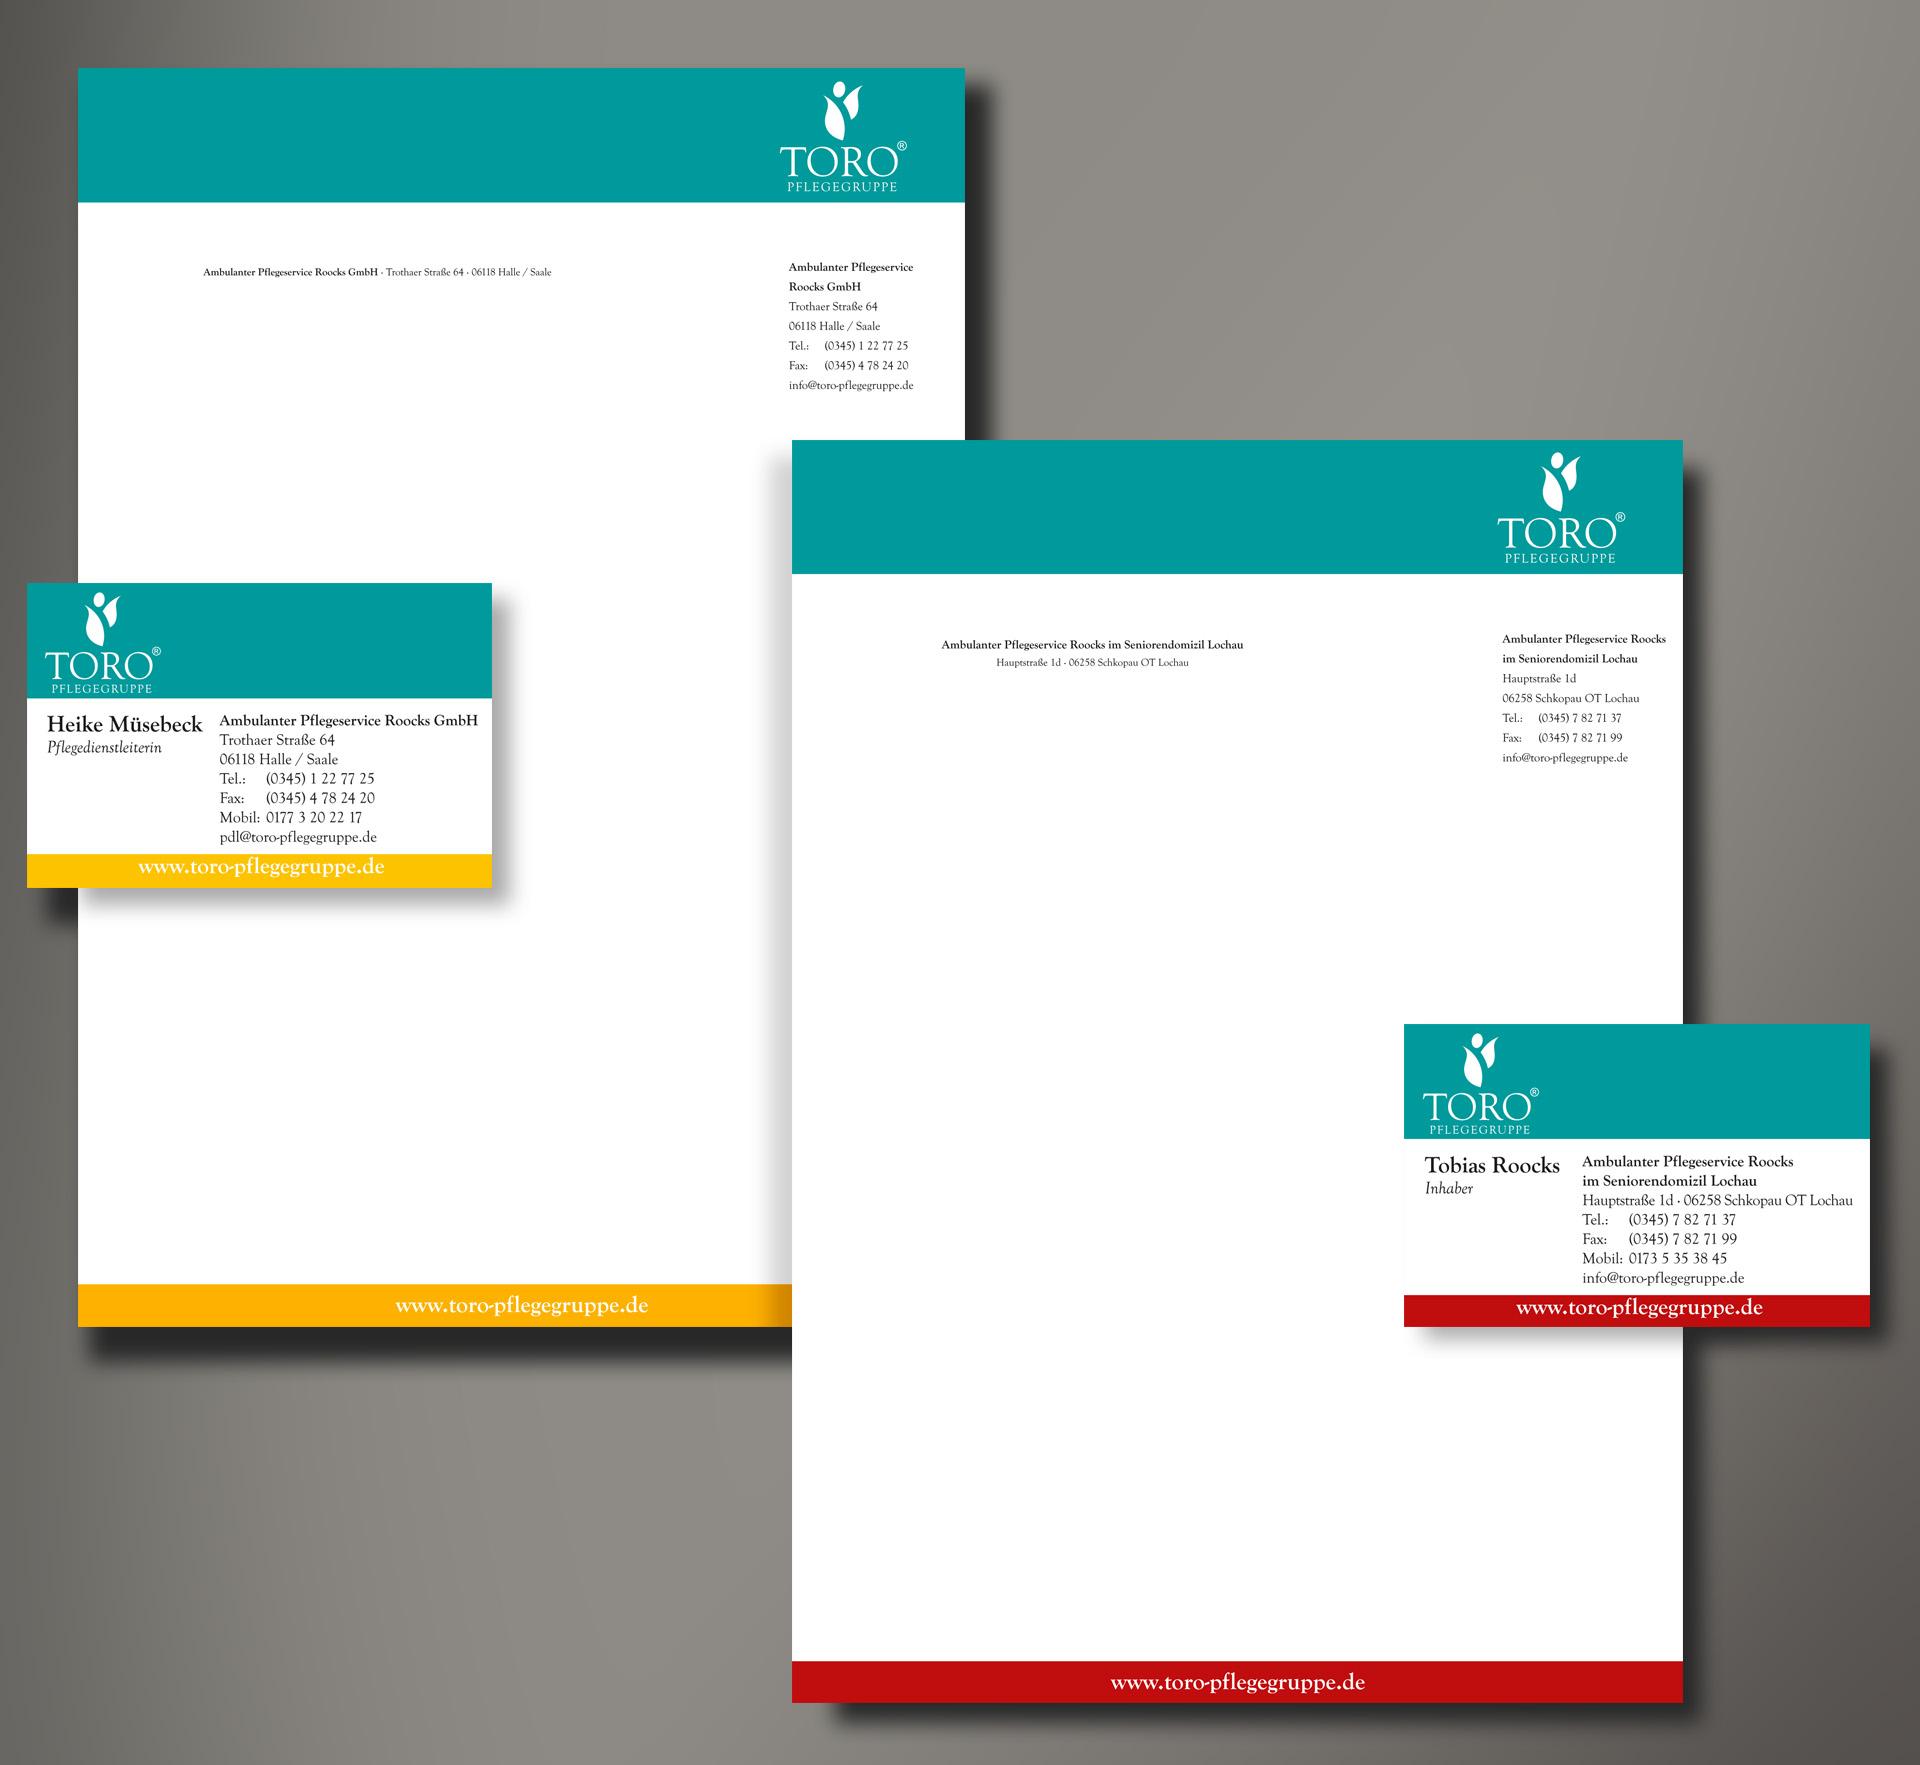 TORO Pflegegruppe Coprorate Design